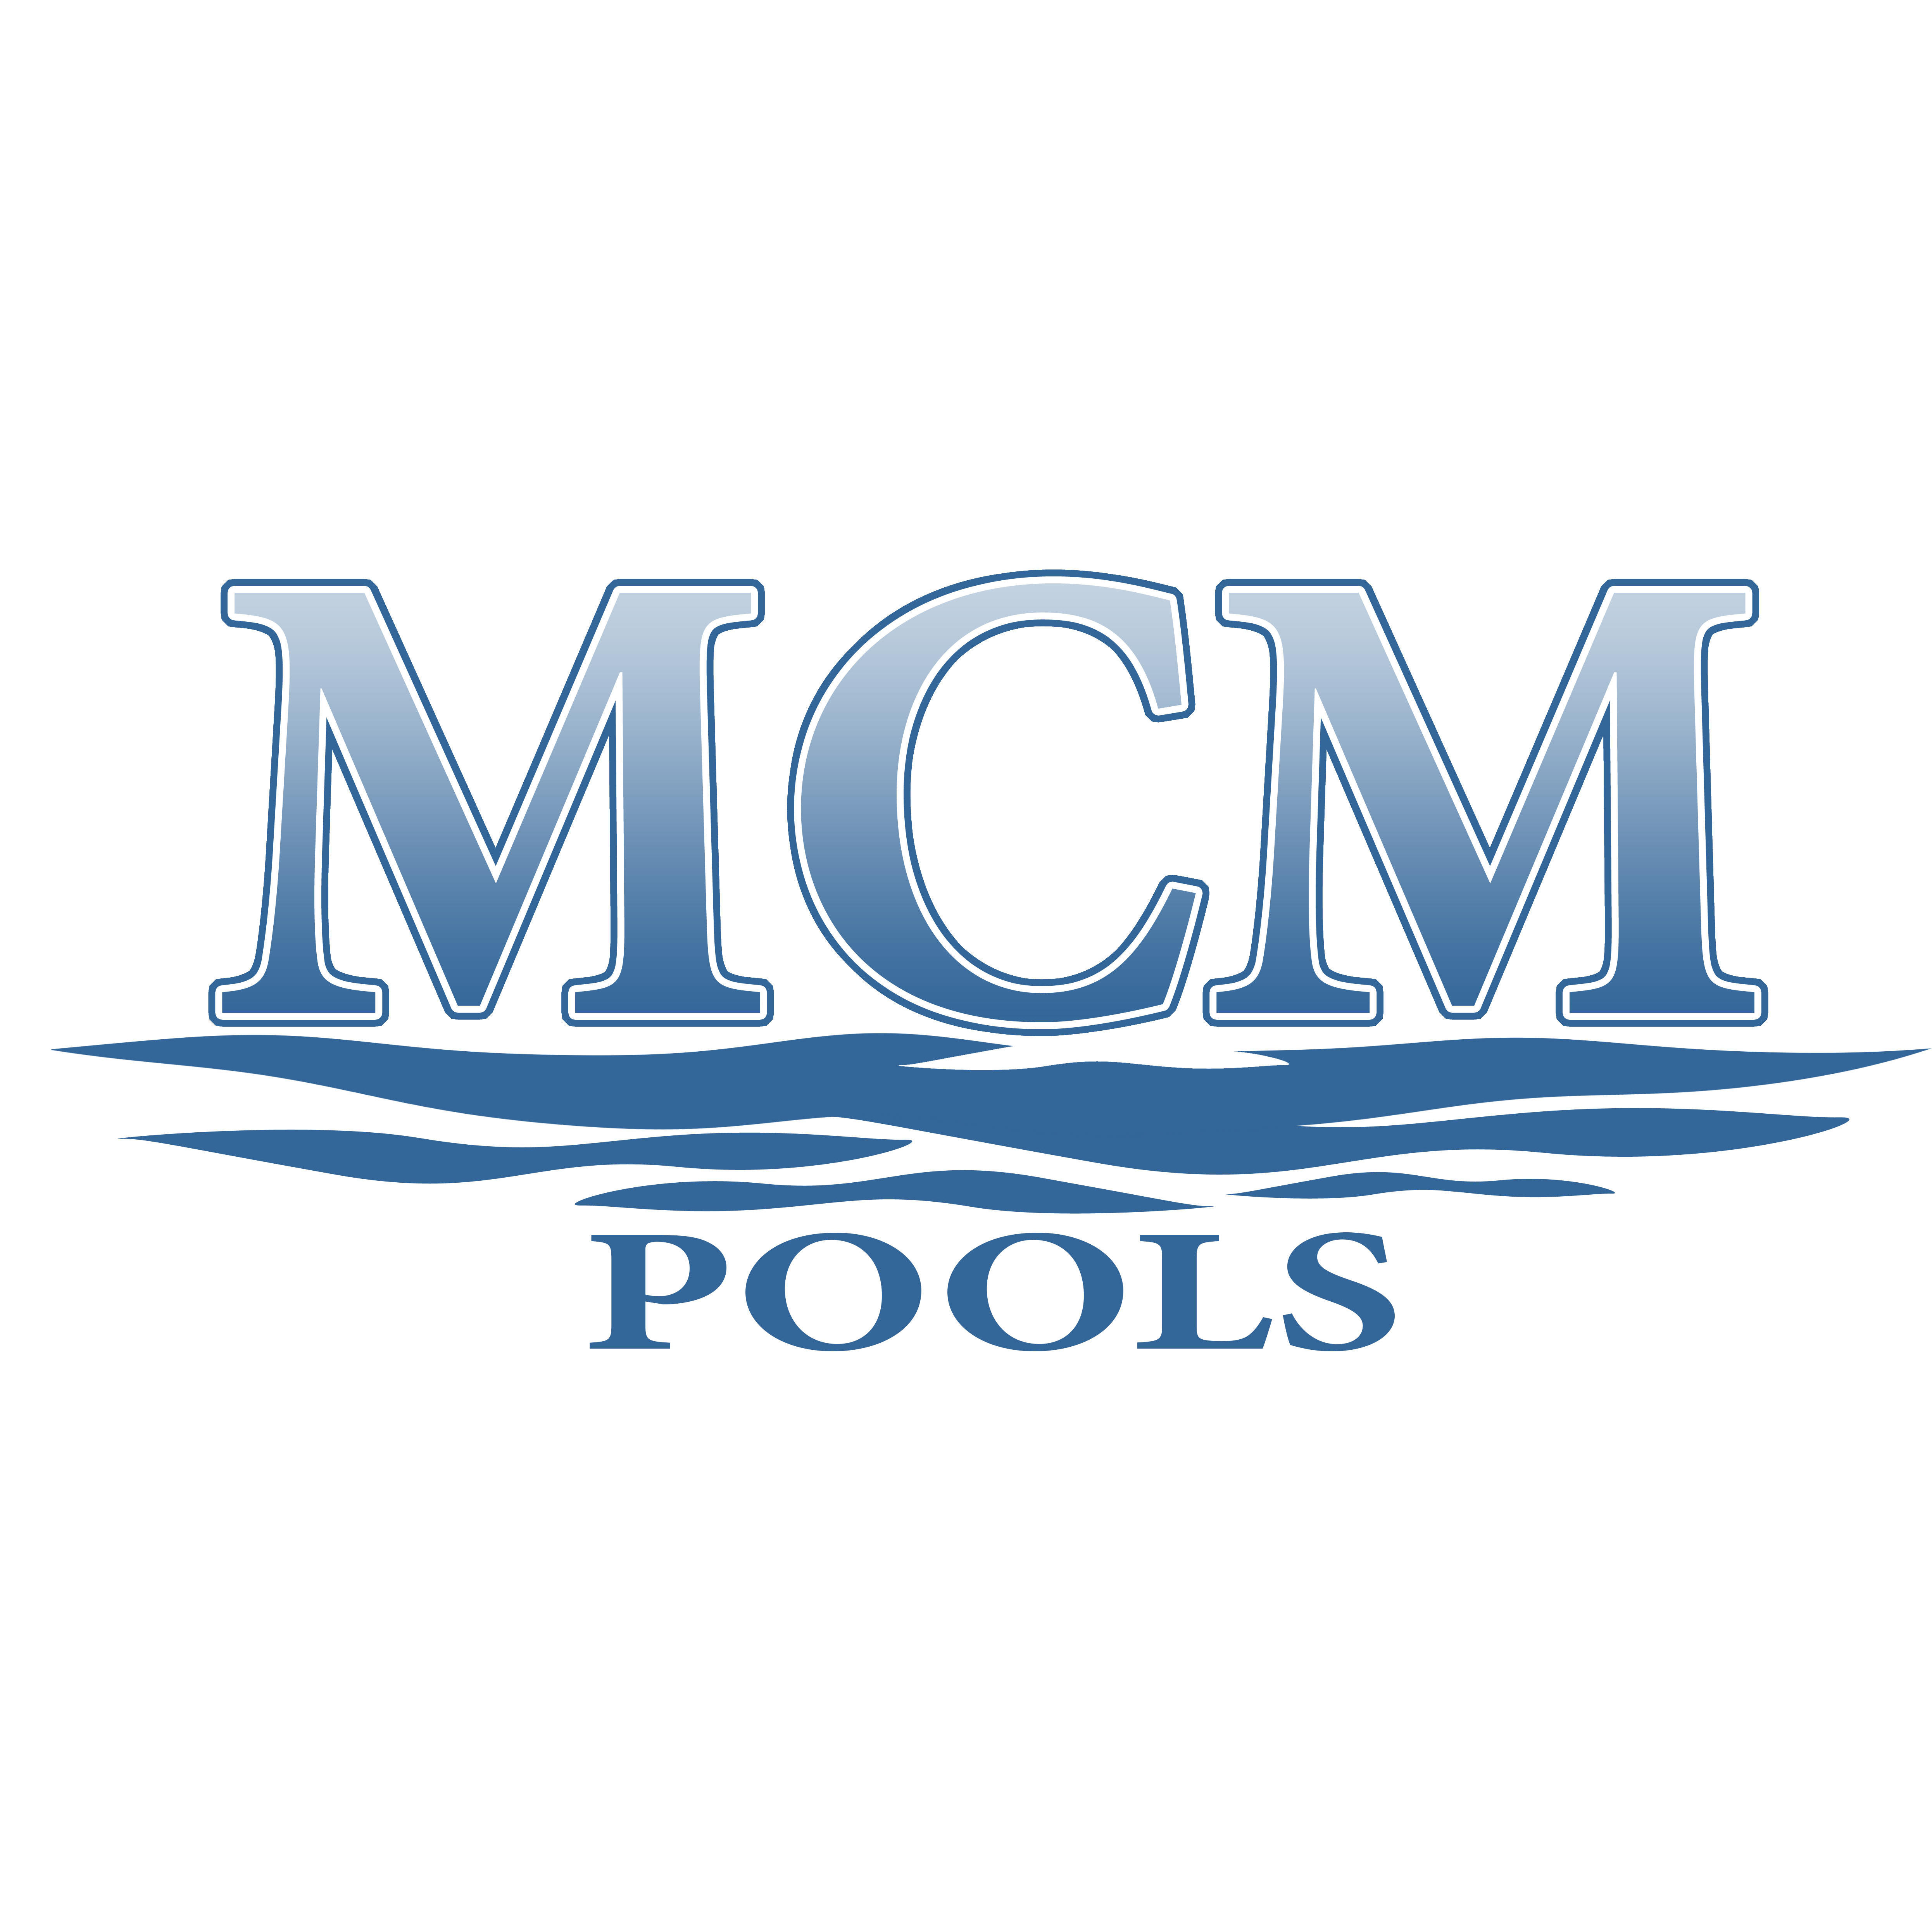 MCM Pools Inc. - Norton, MA - Swimming Pools & Spas